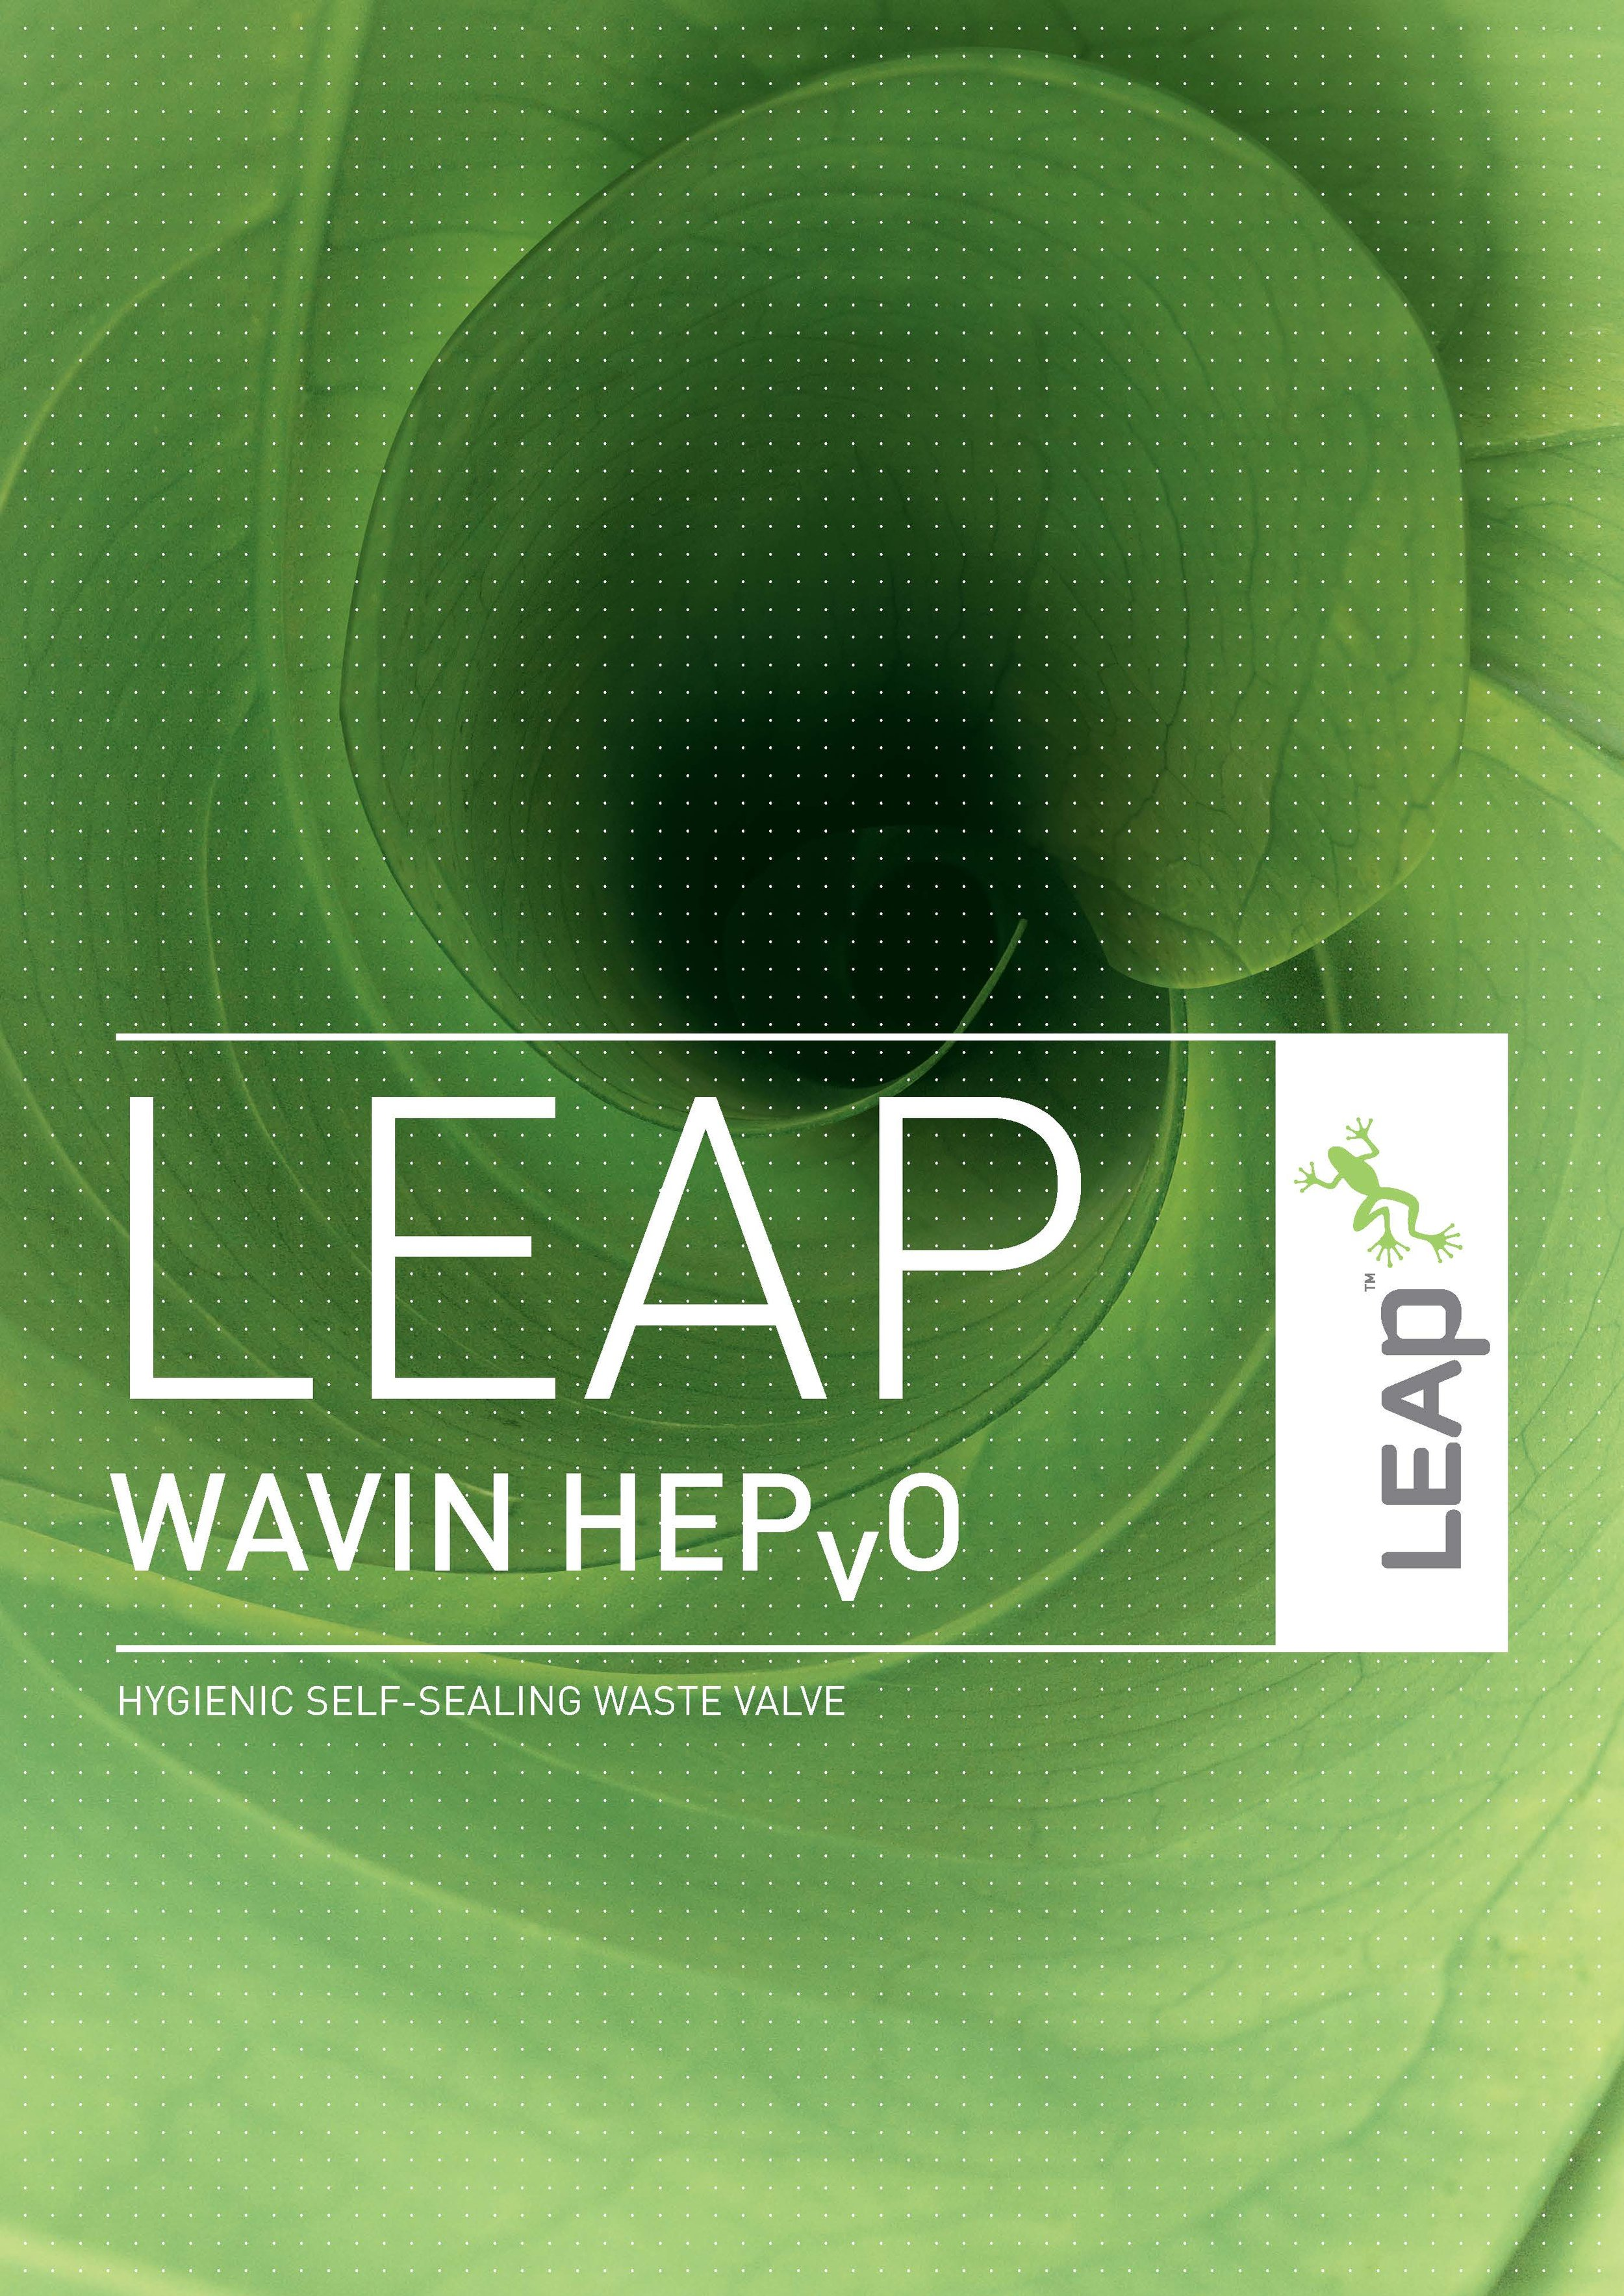 LEAP_WAVIN HEPvO_Hdr.jpg